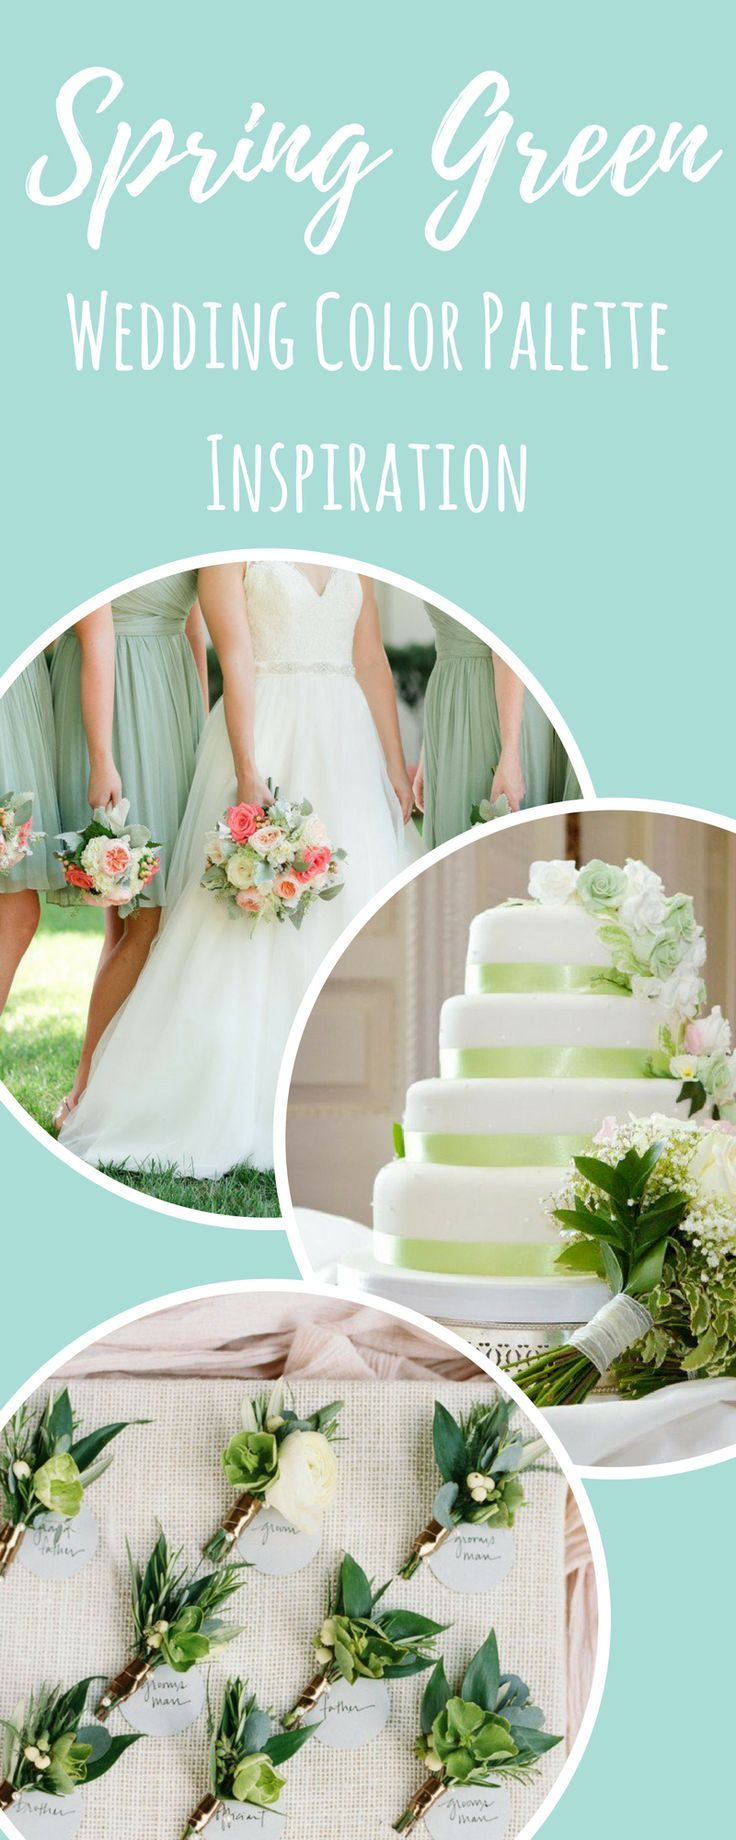 Wedding Color Palette Inspiration: Spring Green   Gorgeous Wedding Motif Inspiration.